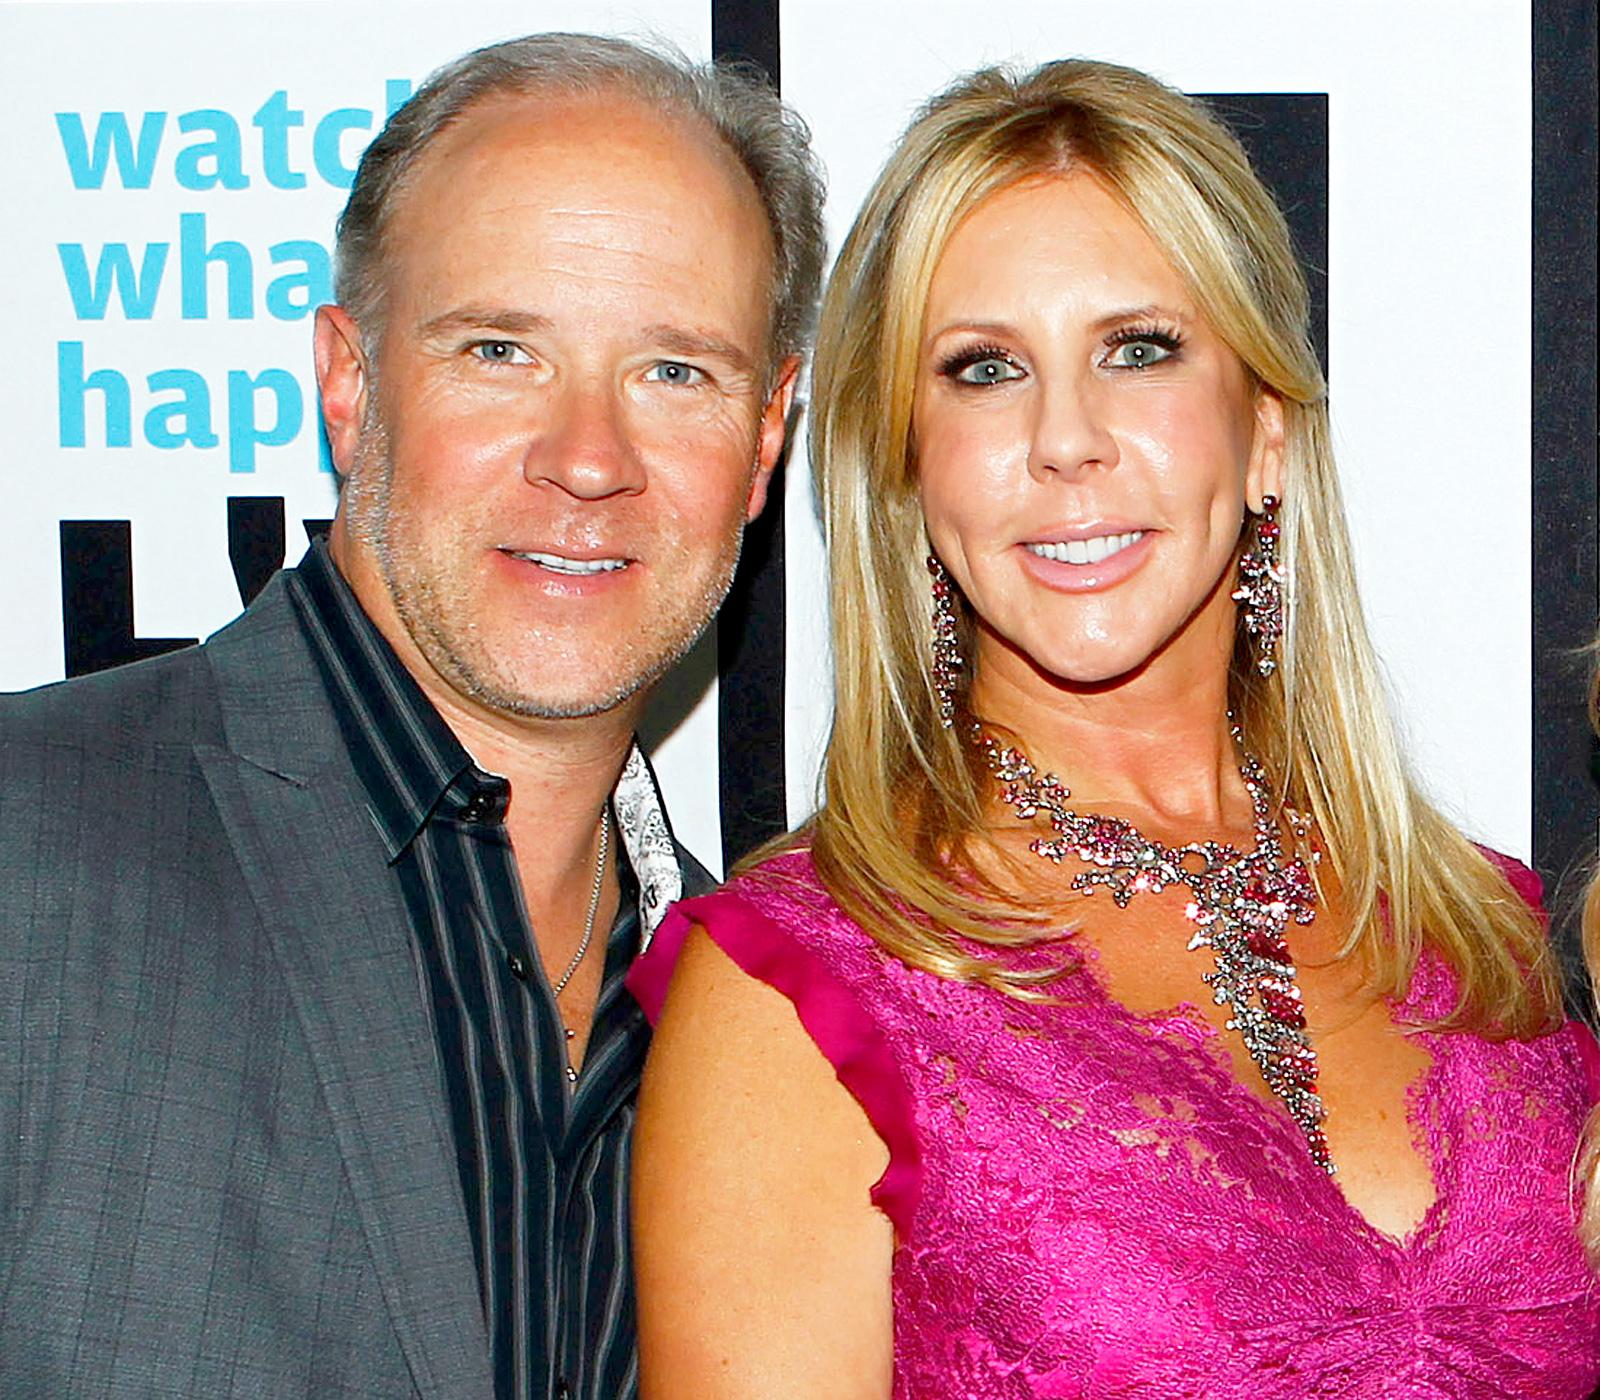 Brooks Ayers and Vicki Gunvalson